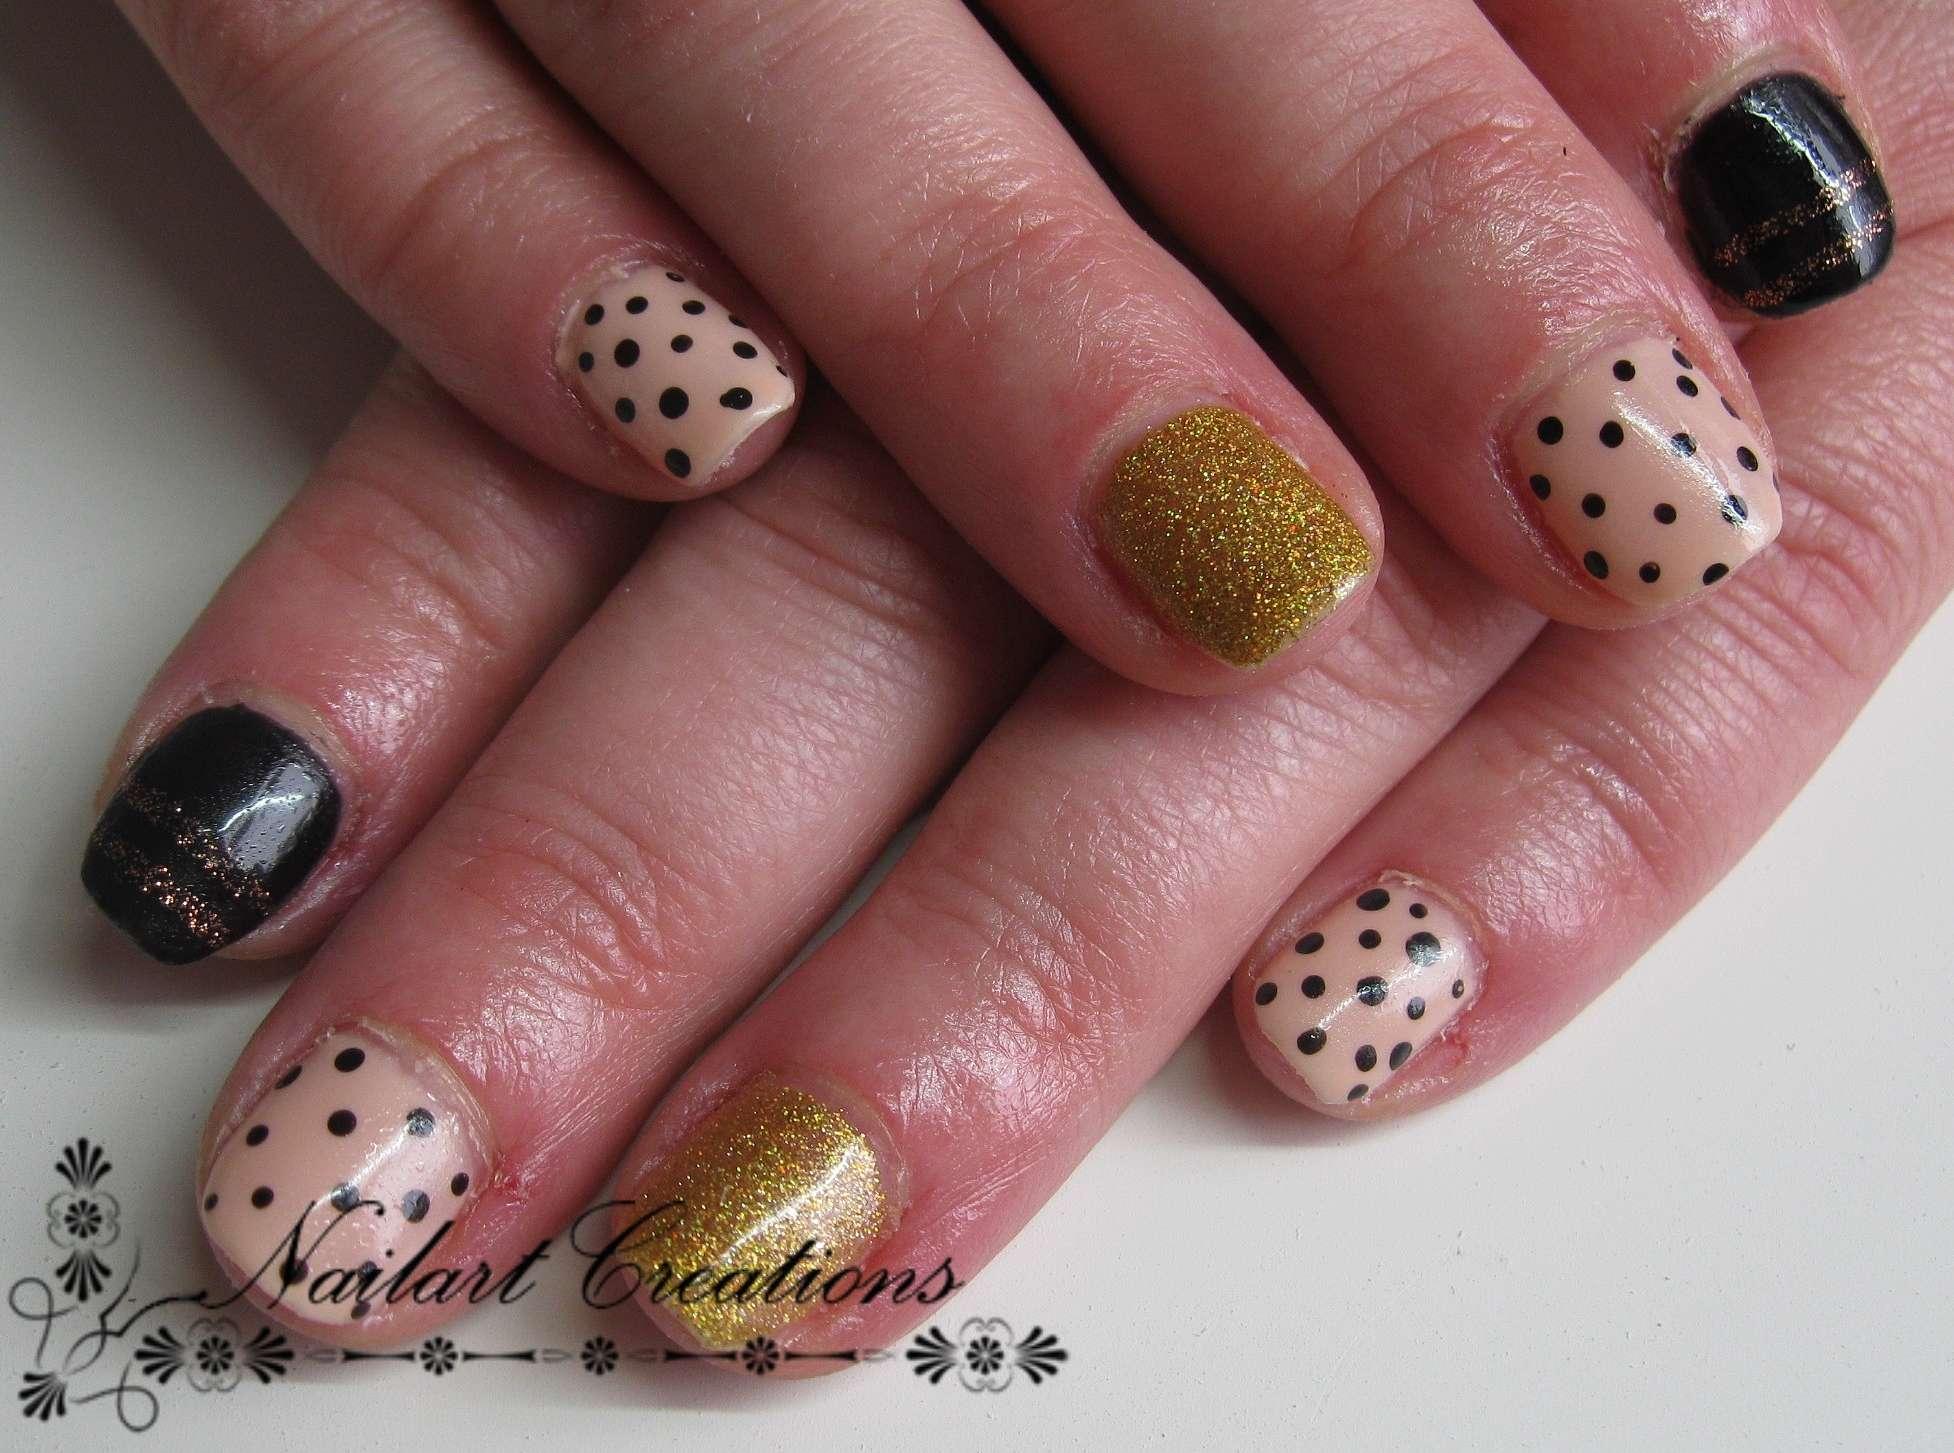 Nailart Creations Gellak Nude Black Gold Combination